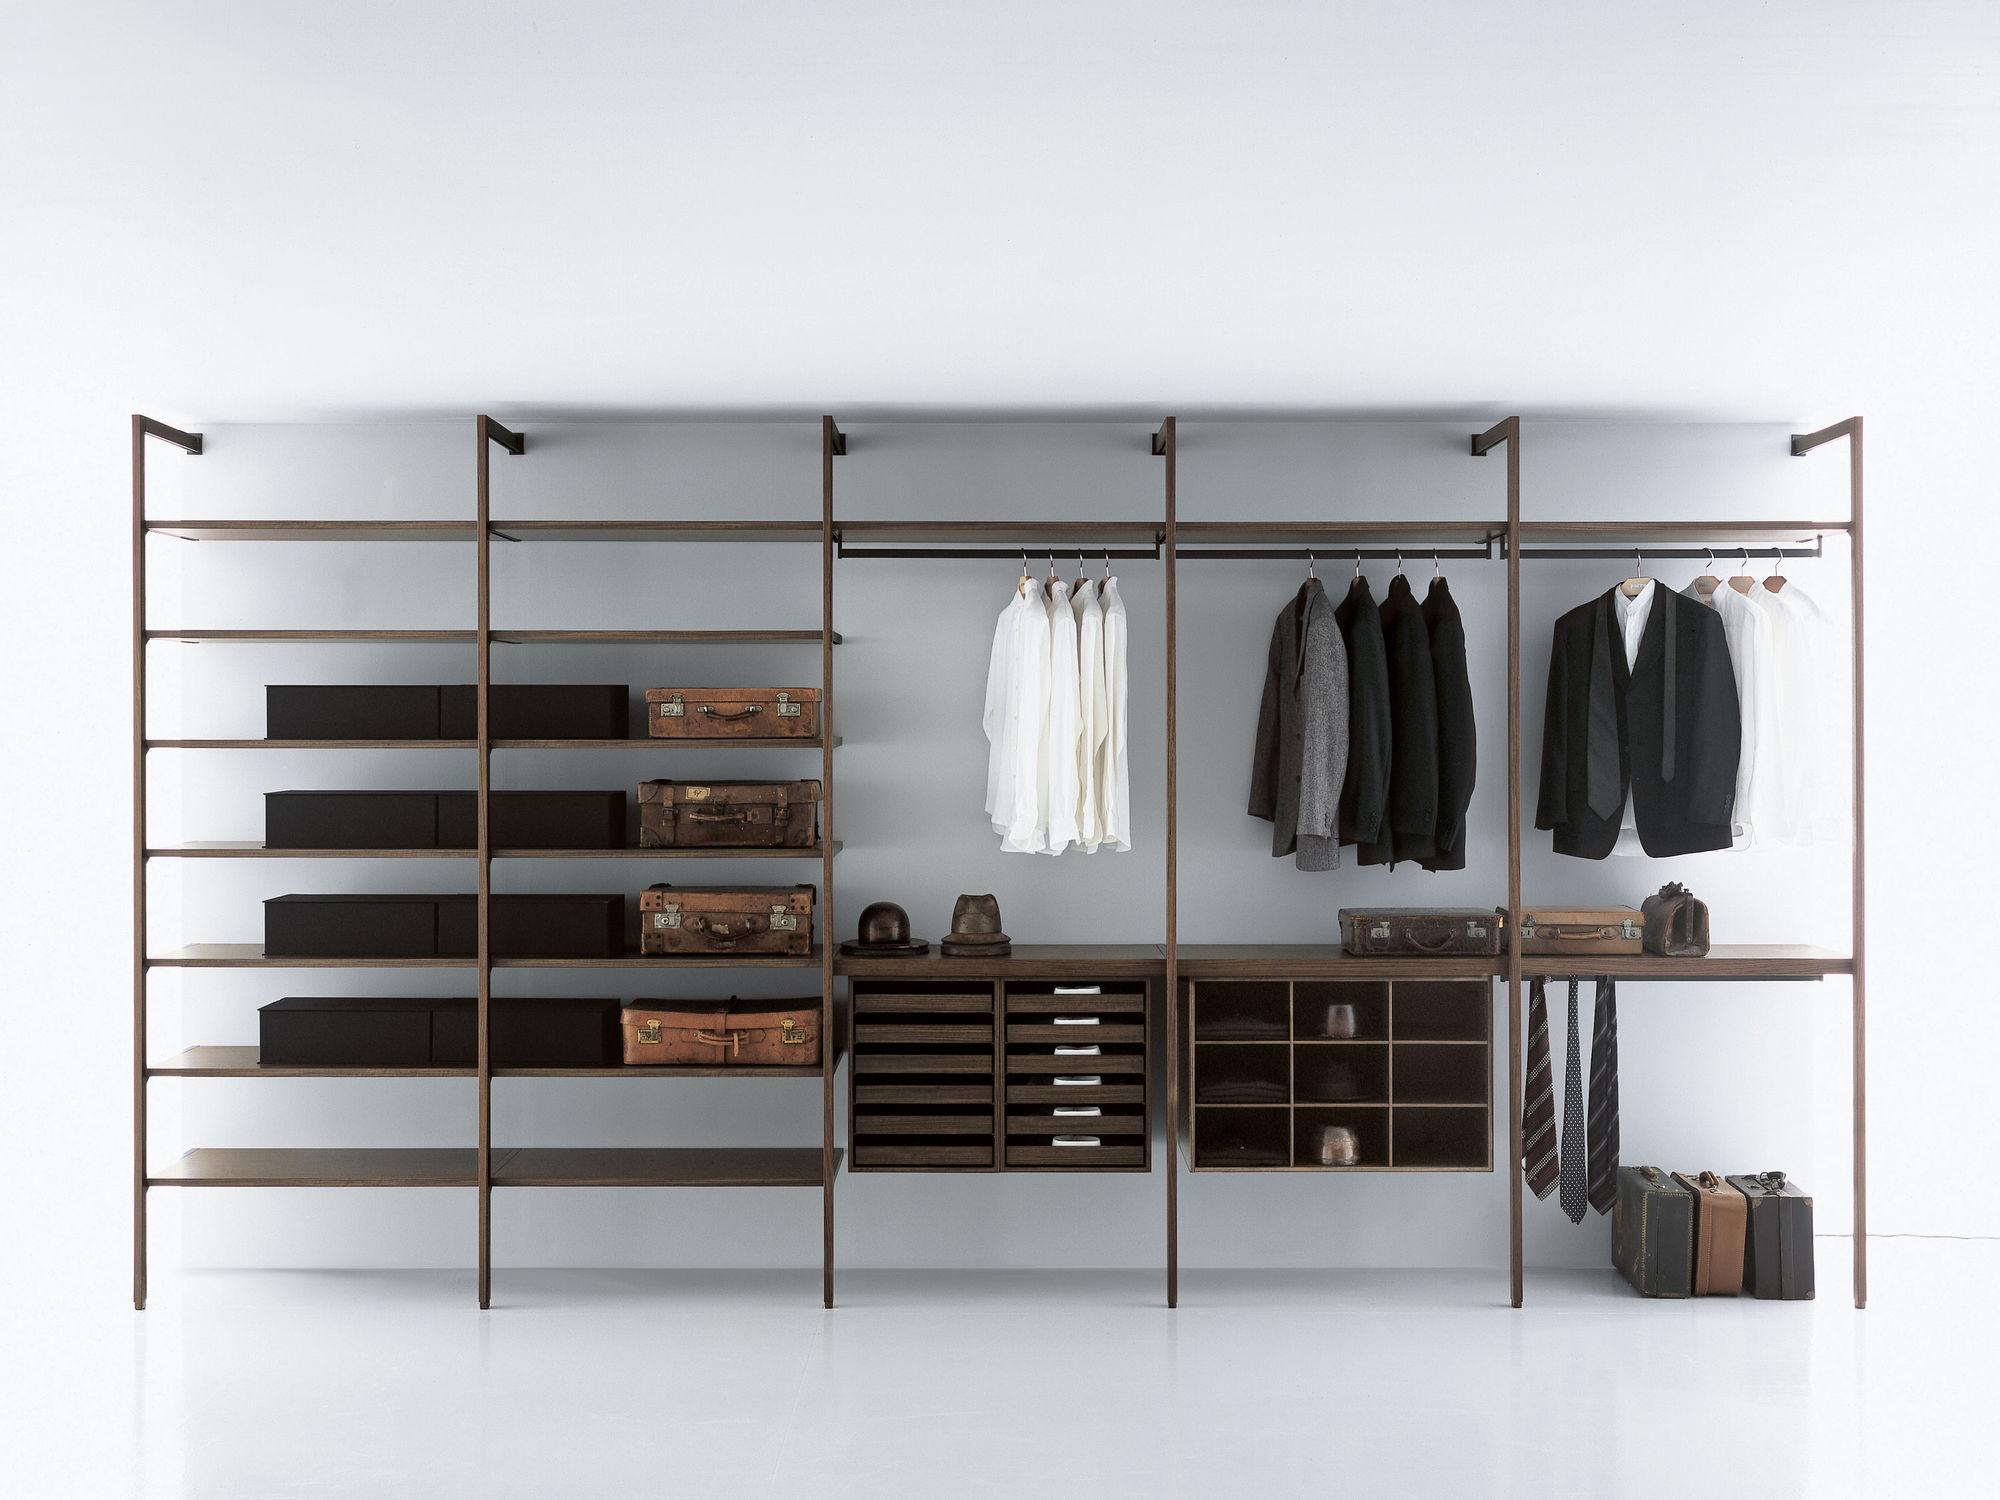 Moderner Begehbarer Kleiderschrank Holz Nach Mass High End Porro